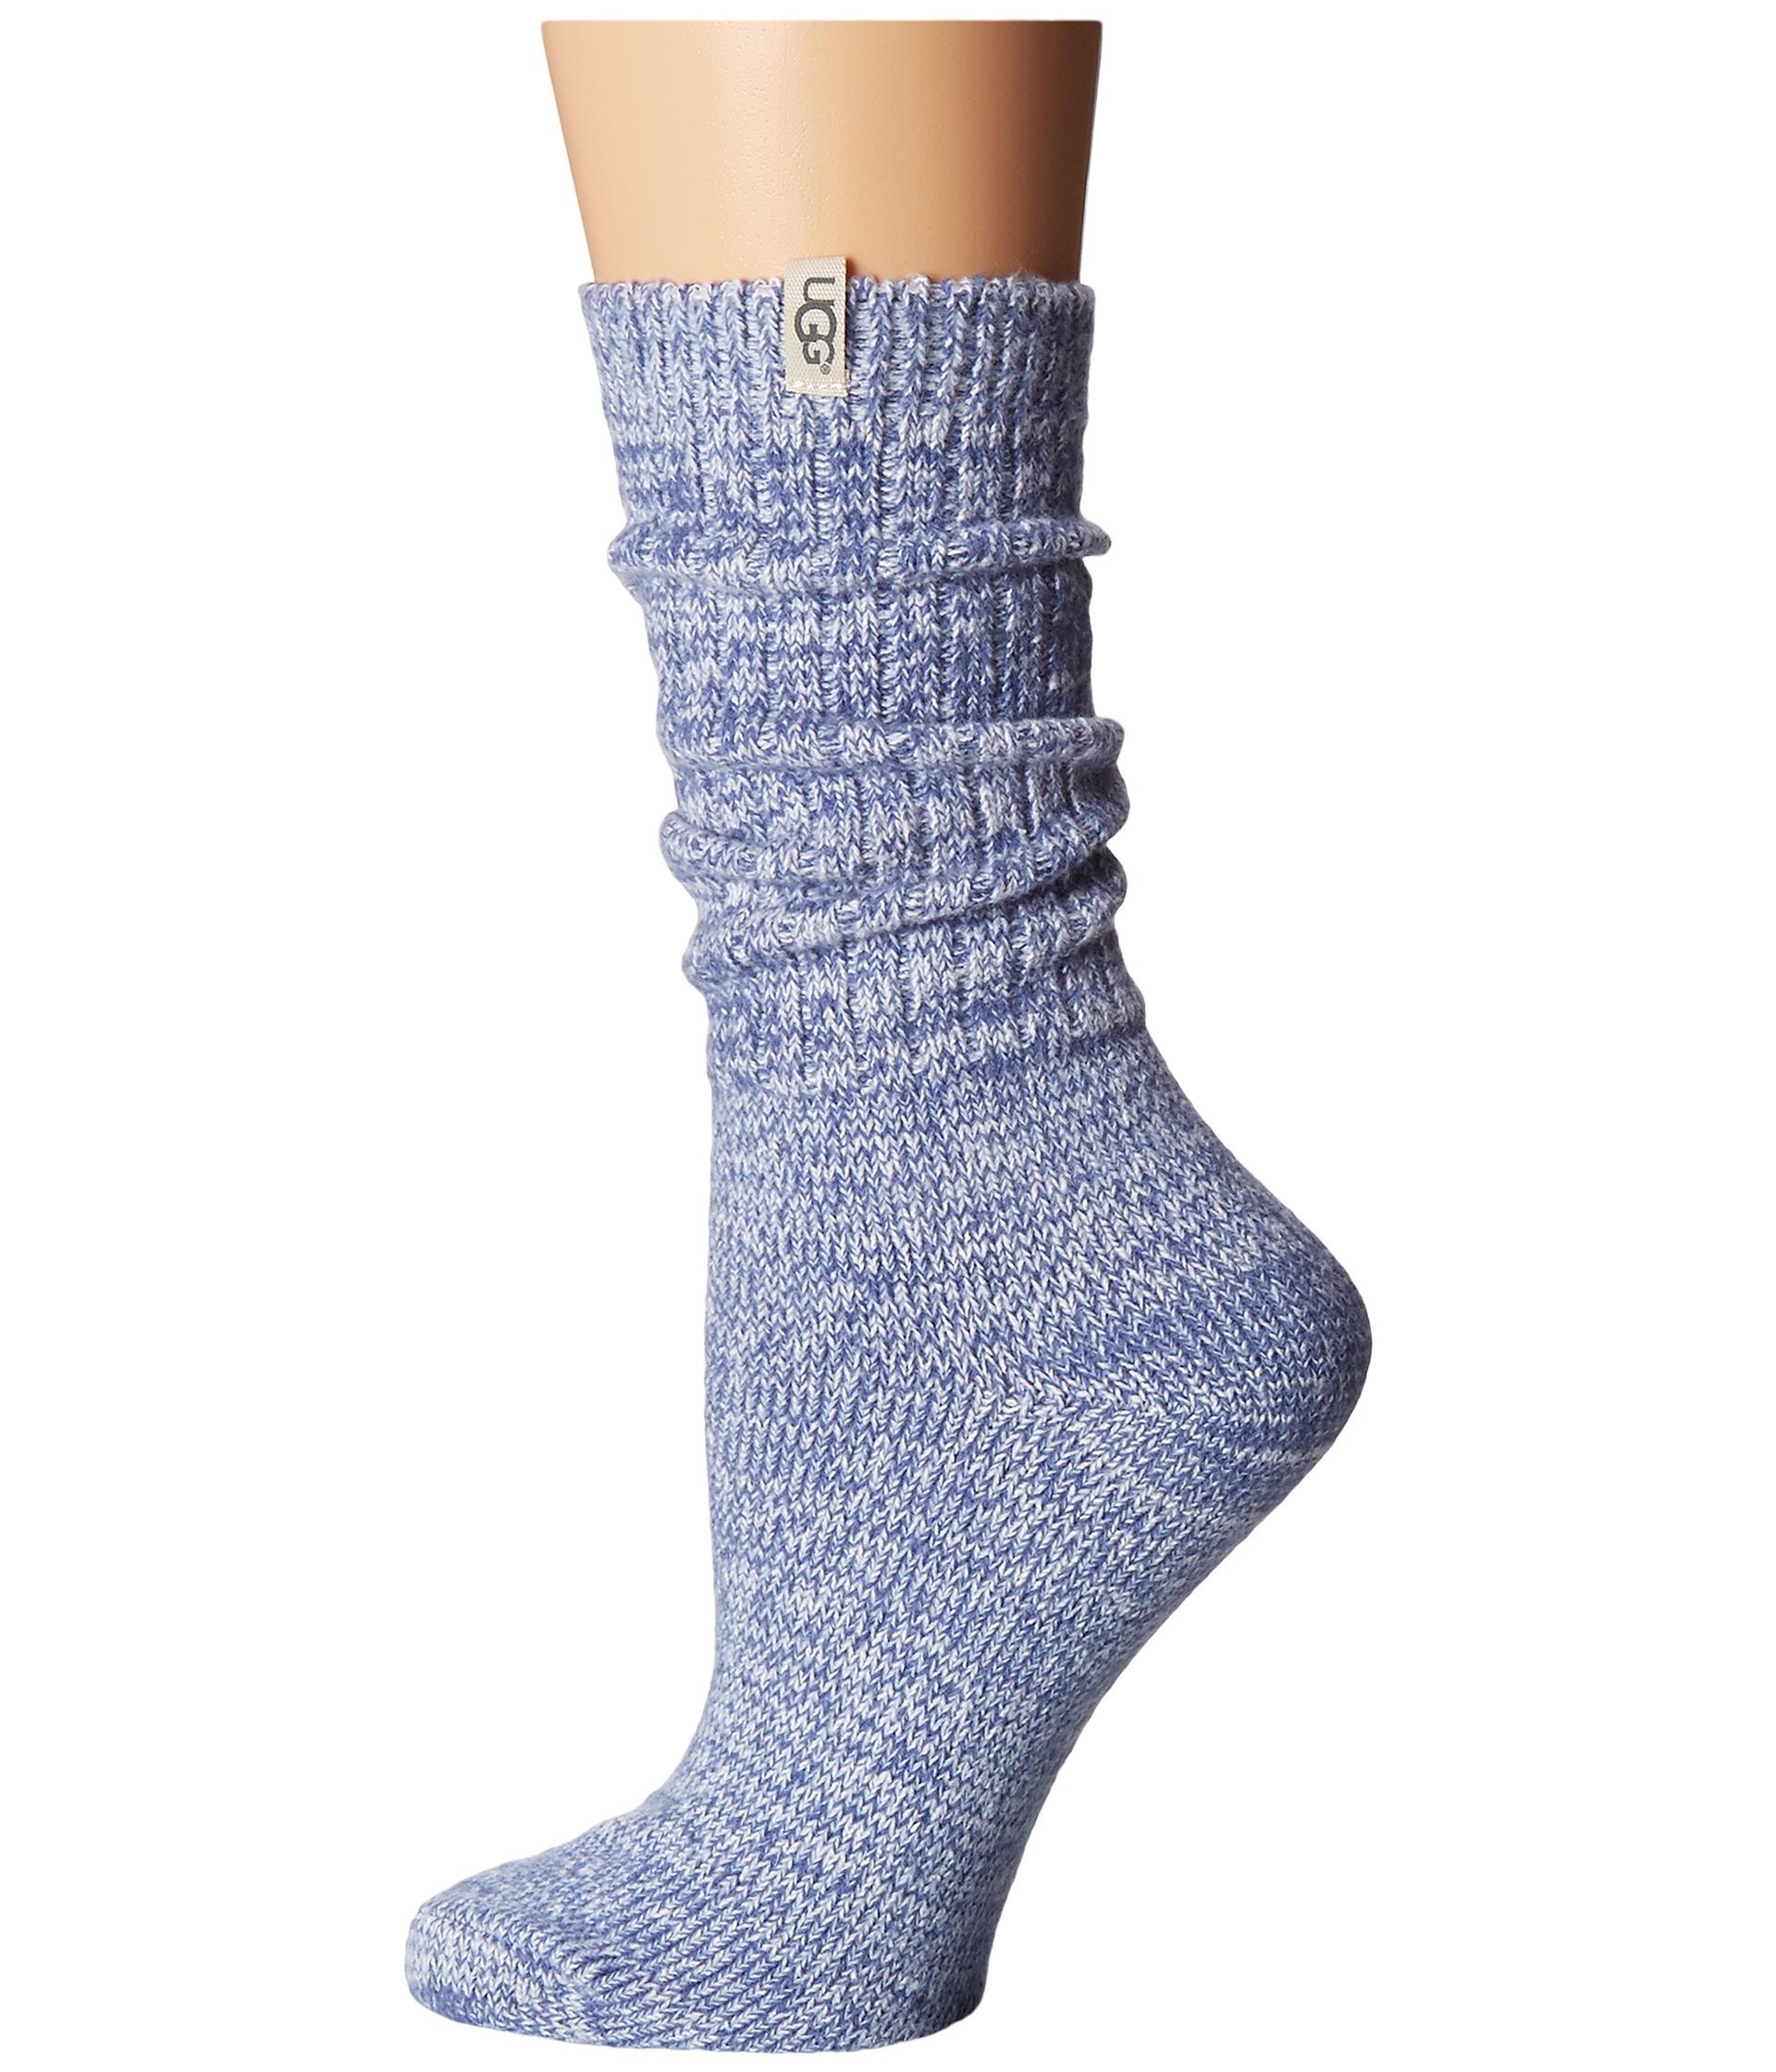 Slouch Socks Knitting Pattern : UGG Rib Knit Slouchy Crew Socks at Zappos.com